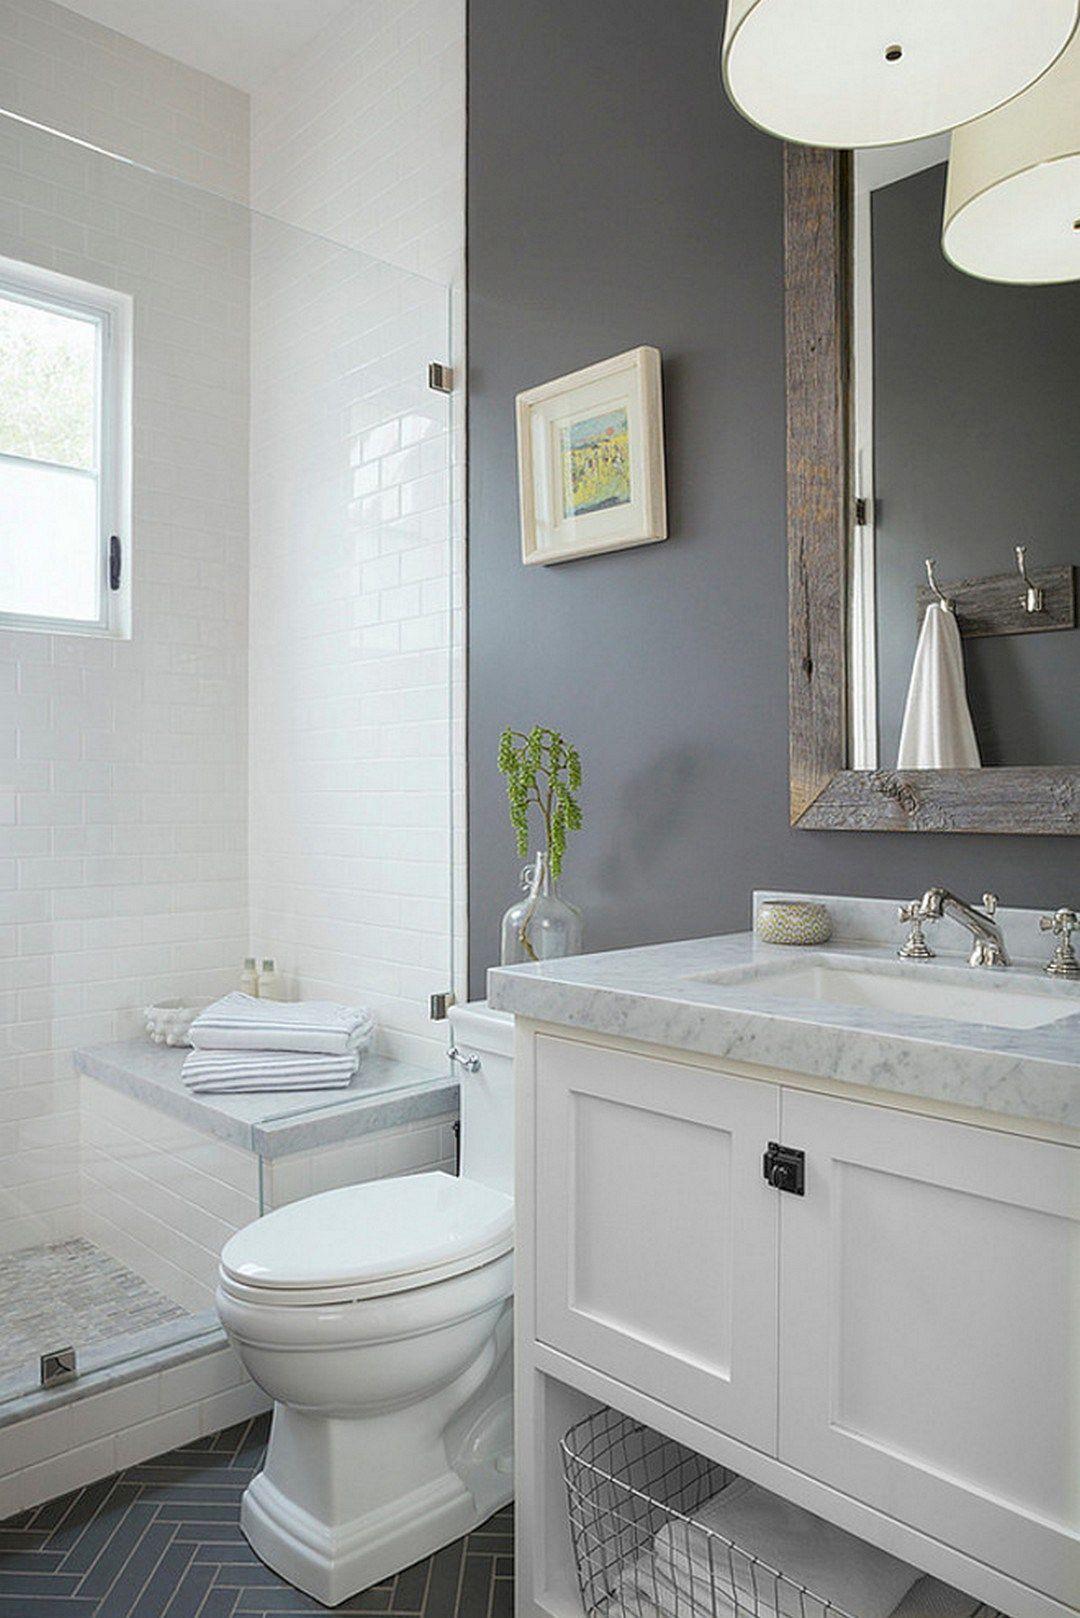 1970 badezimmer dekor best small bathroom remodel  design ideas  bathroom remodeling